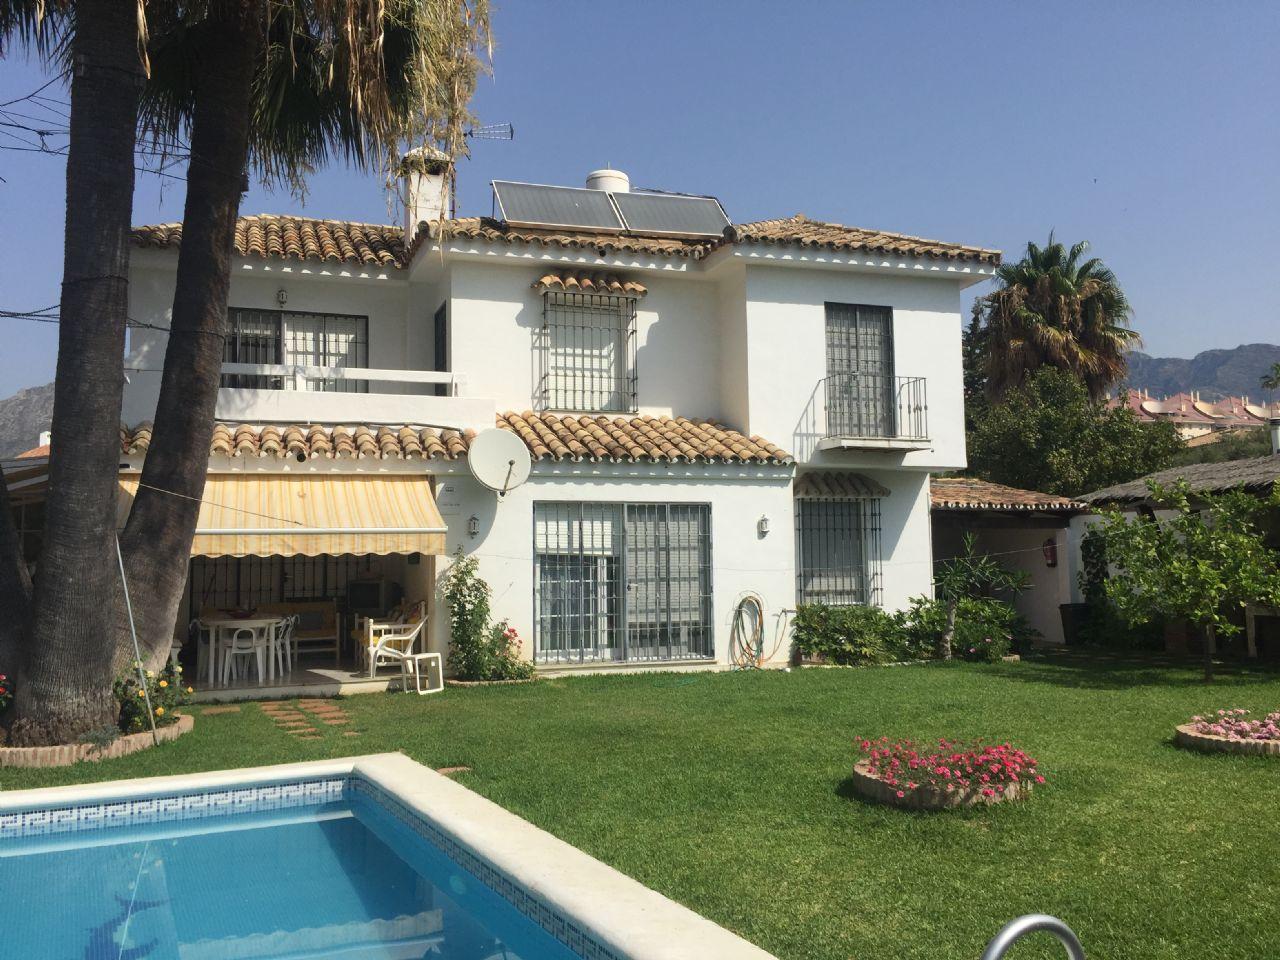 Casa / Chalet en Marbella, Huerta Belón, venta